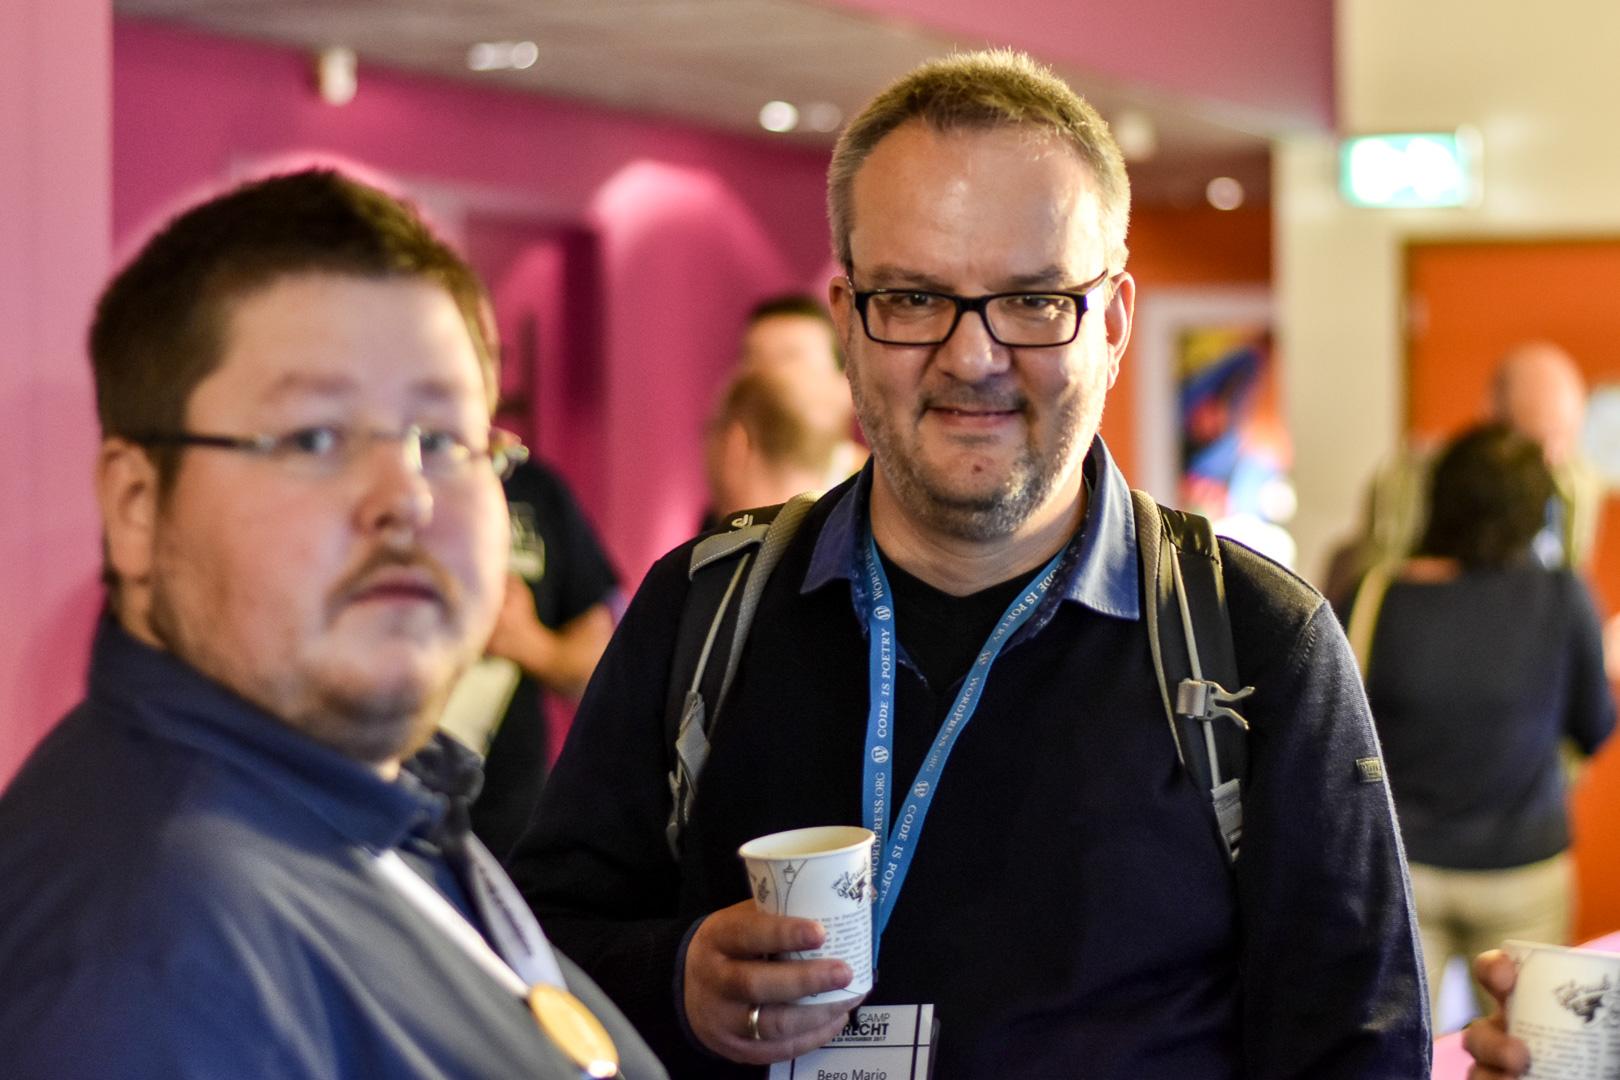 WordCamp Utrecht, Matthias Kurs and Bego Maria Garde